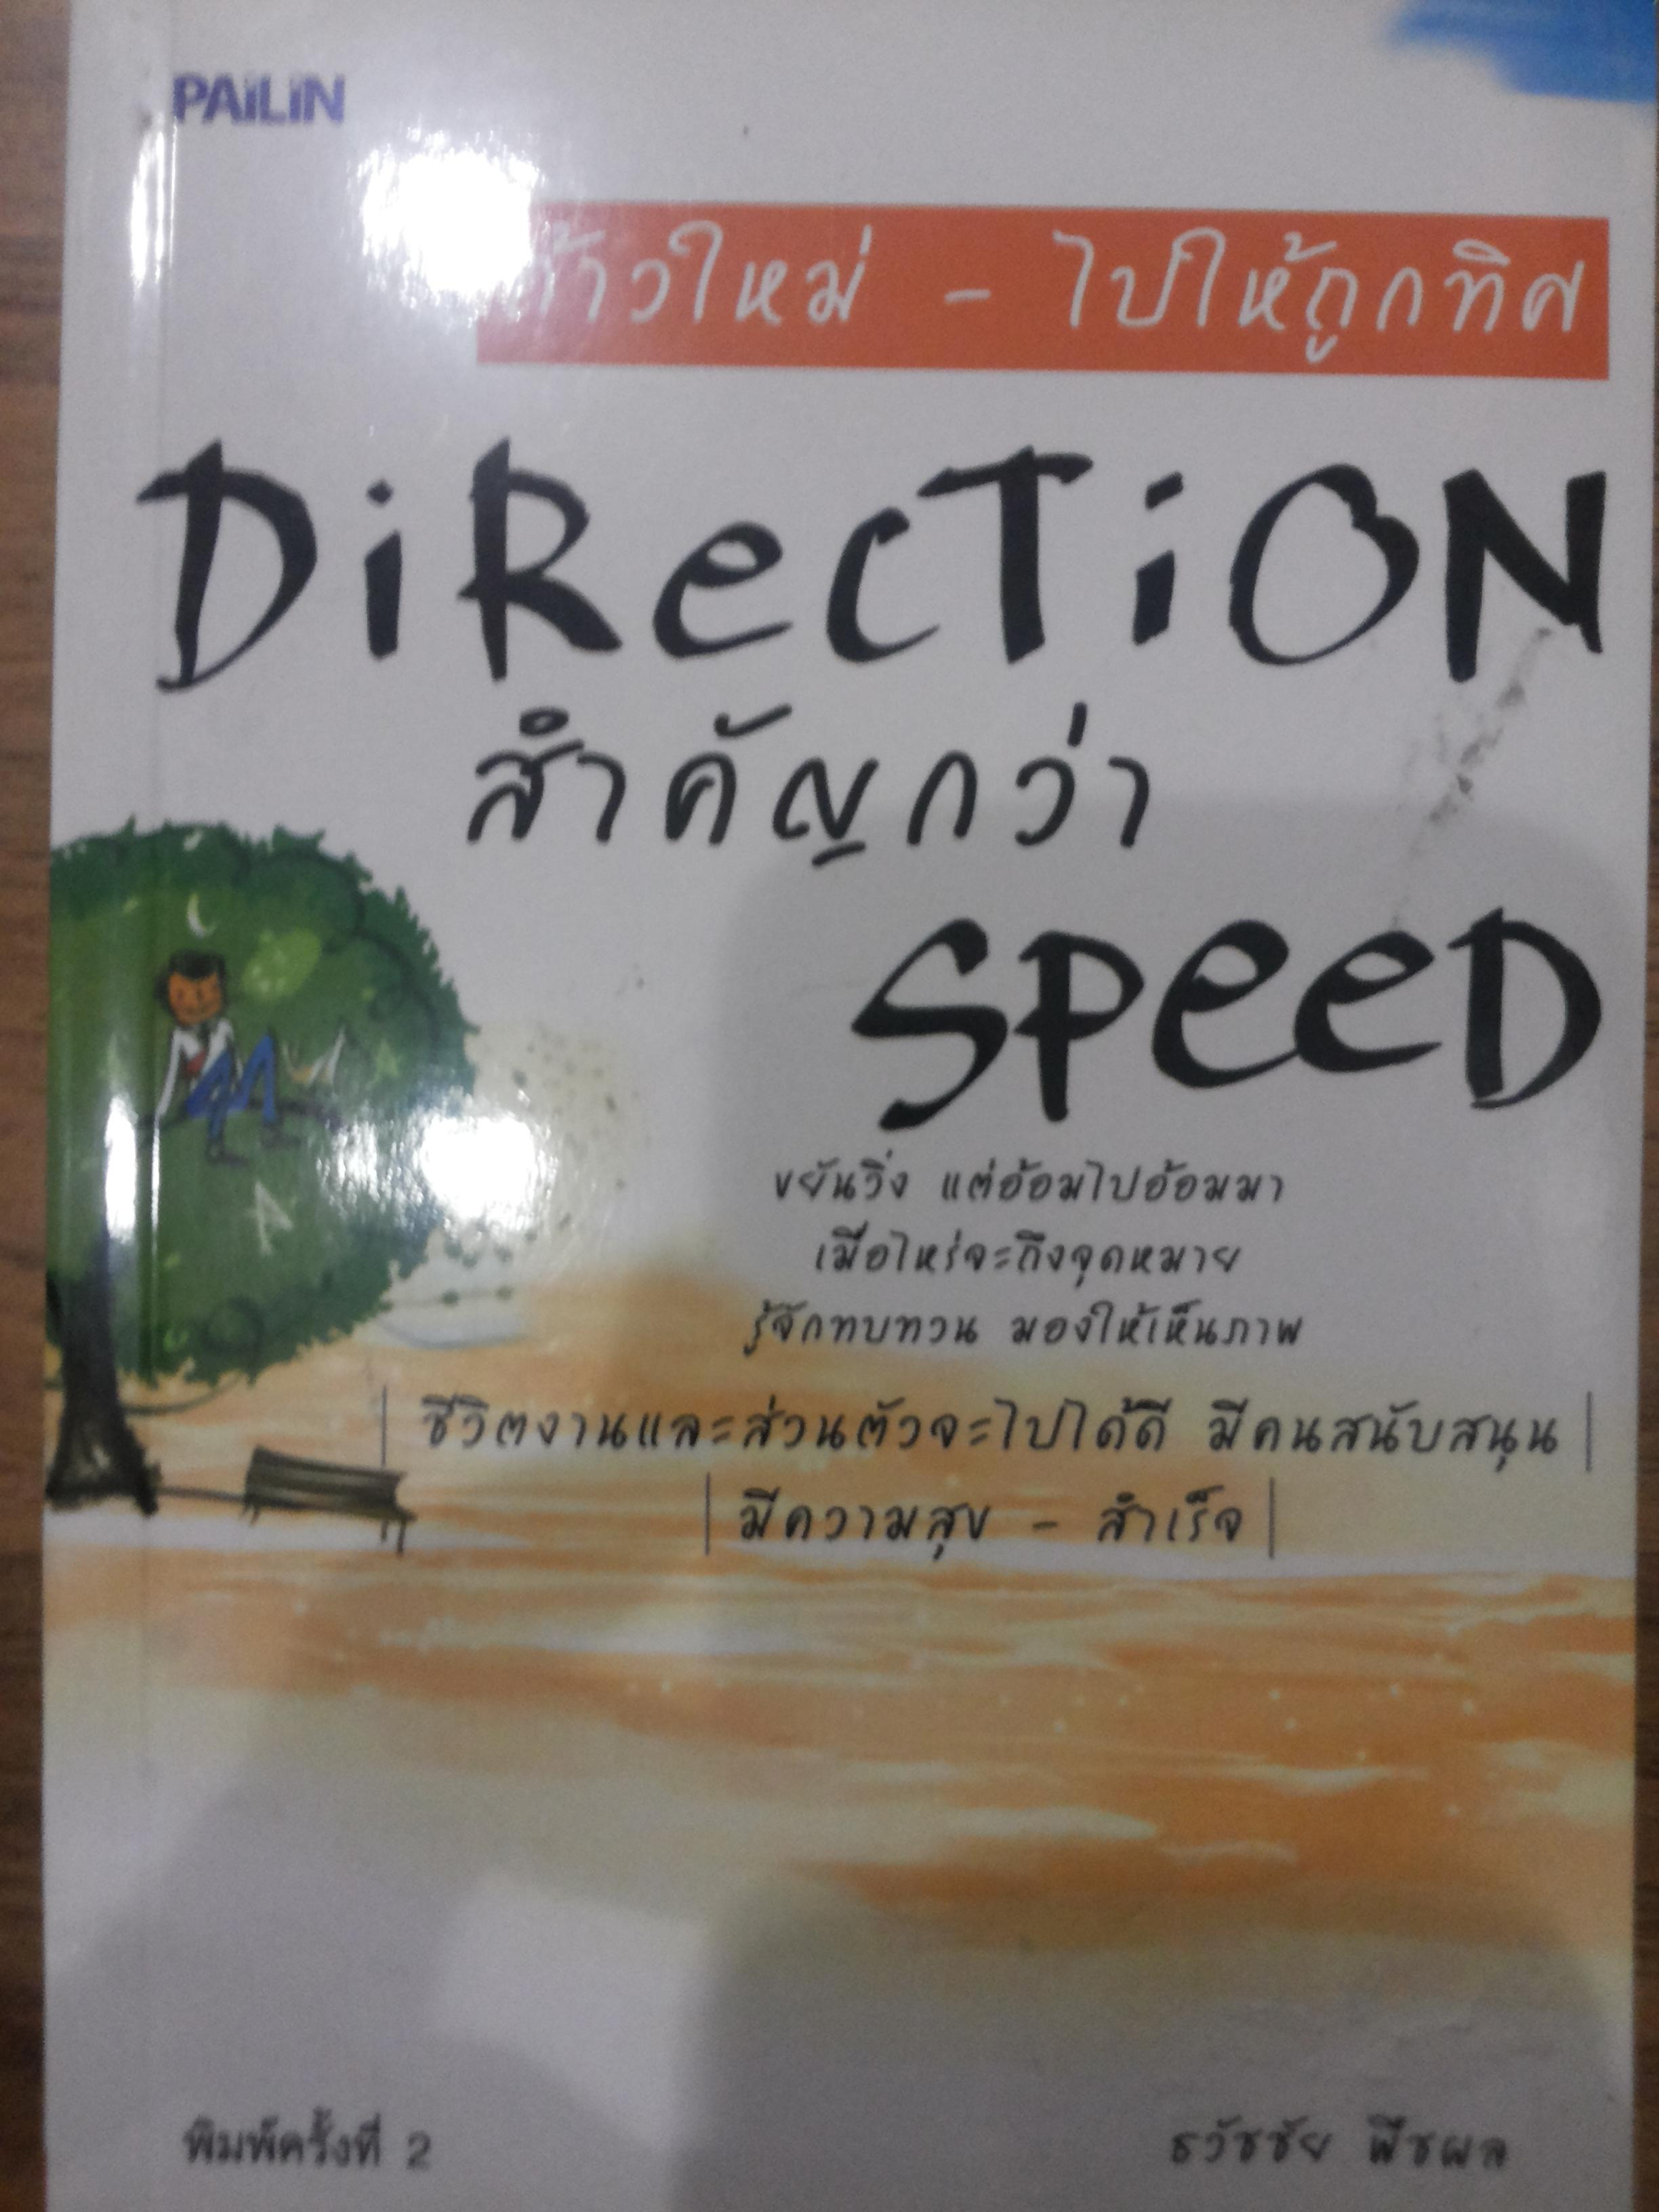 Direction สำคัญกว่า Speed